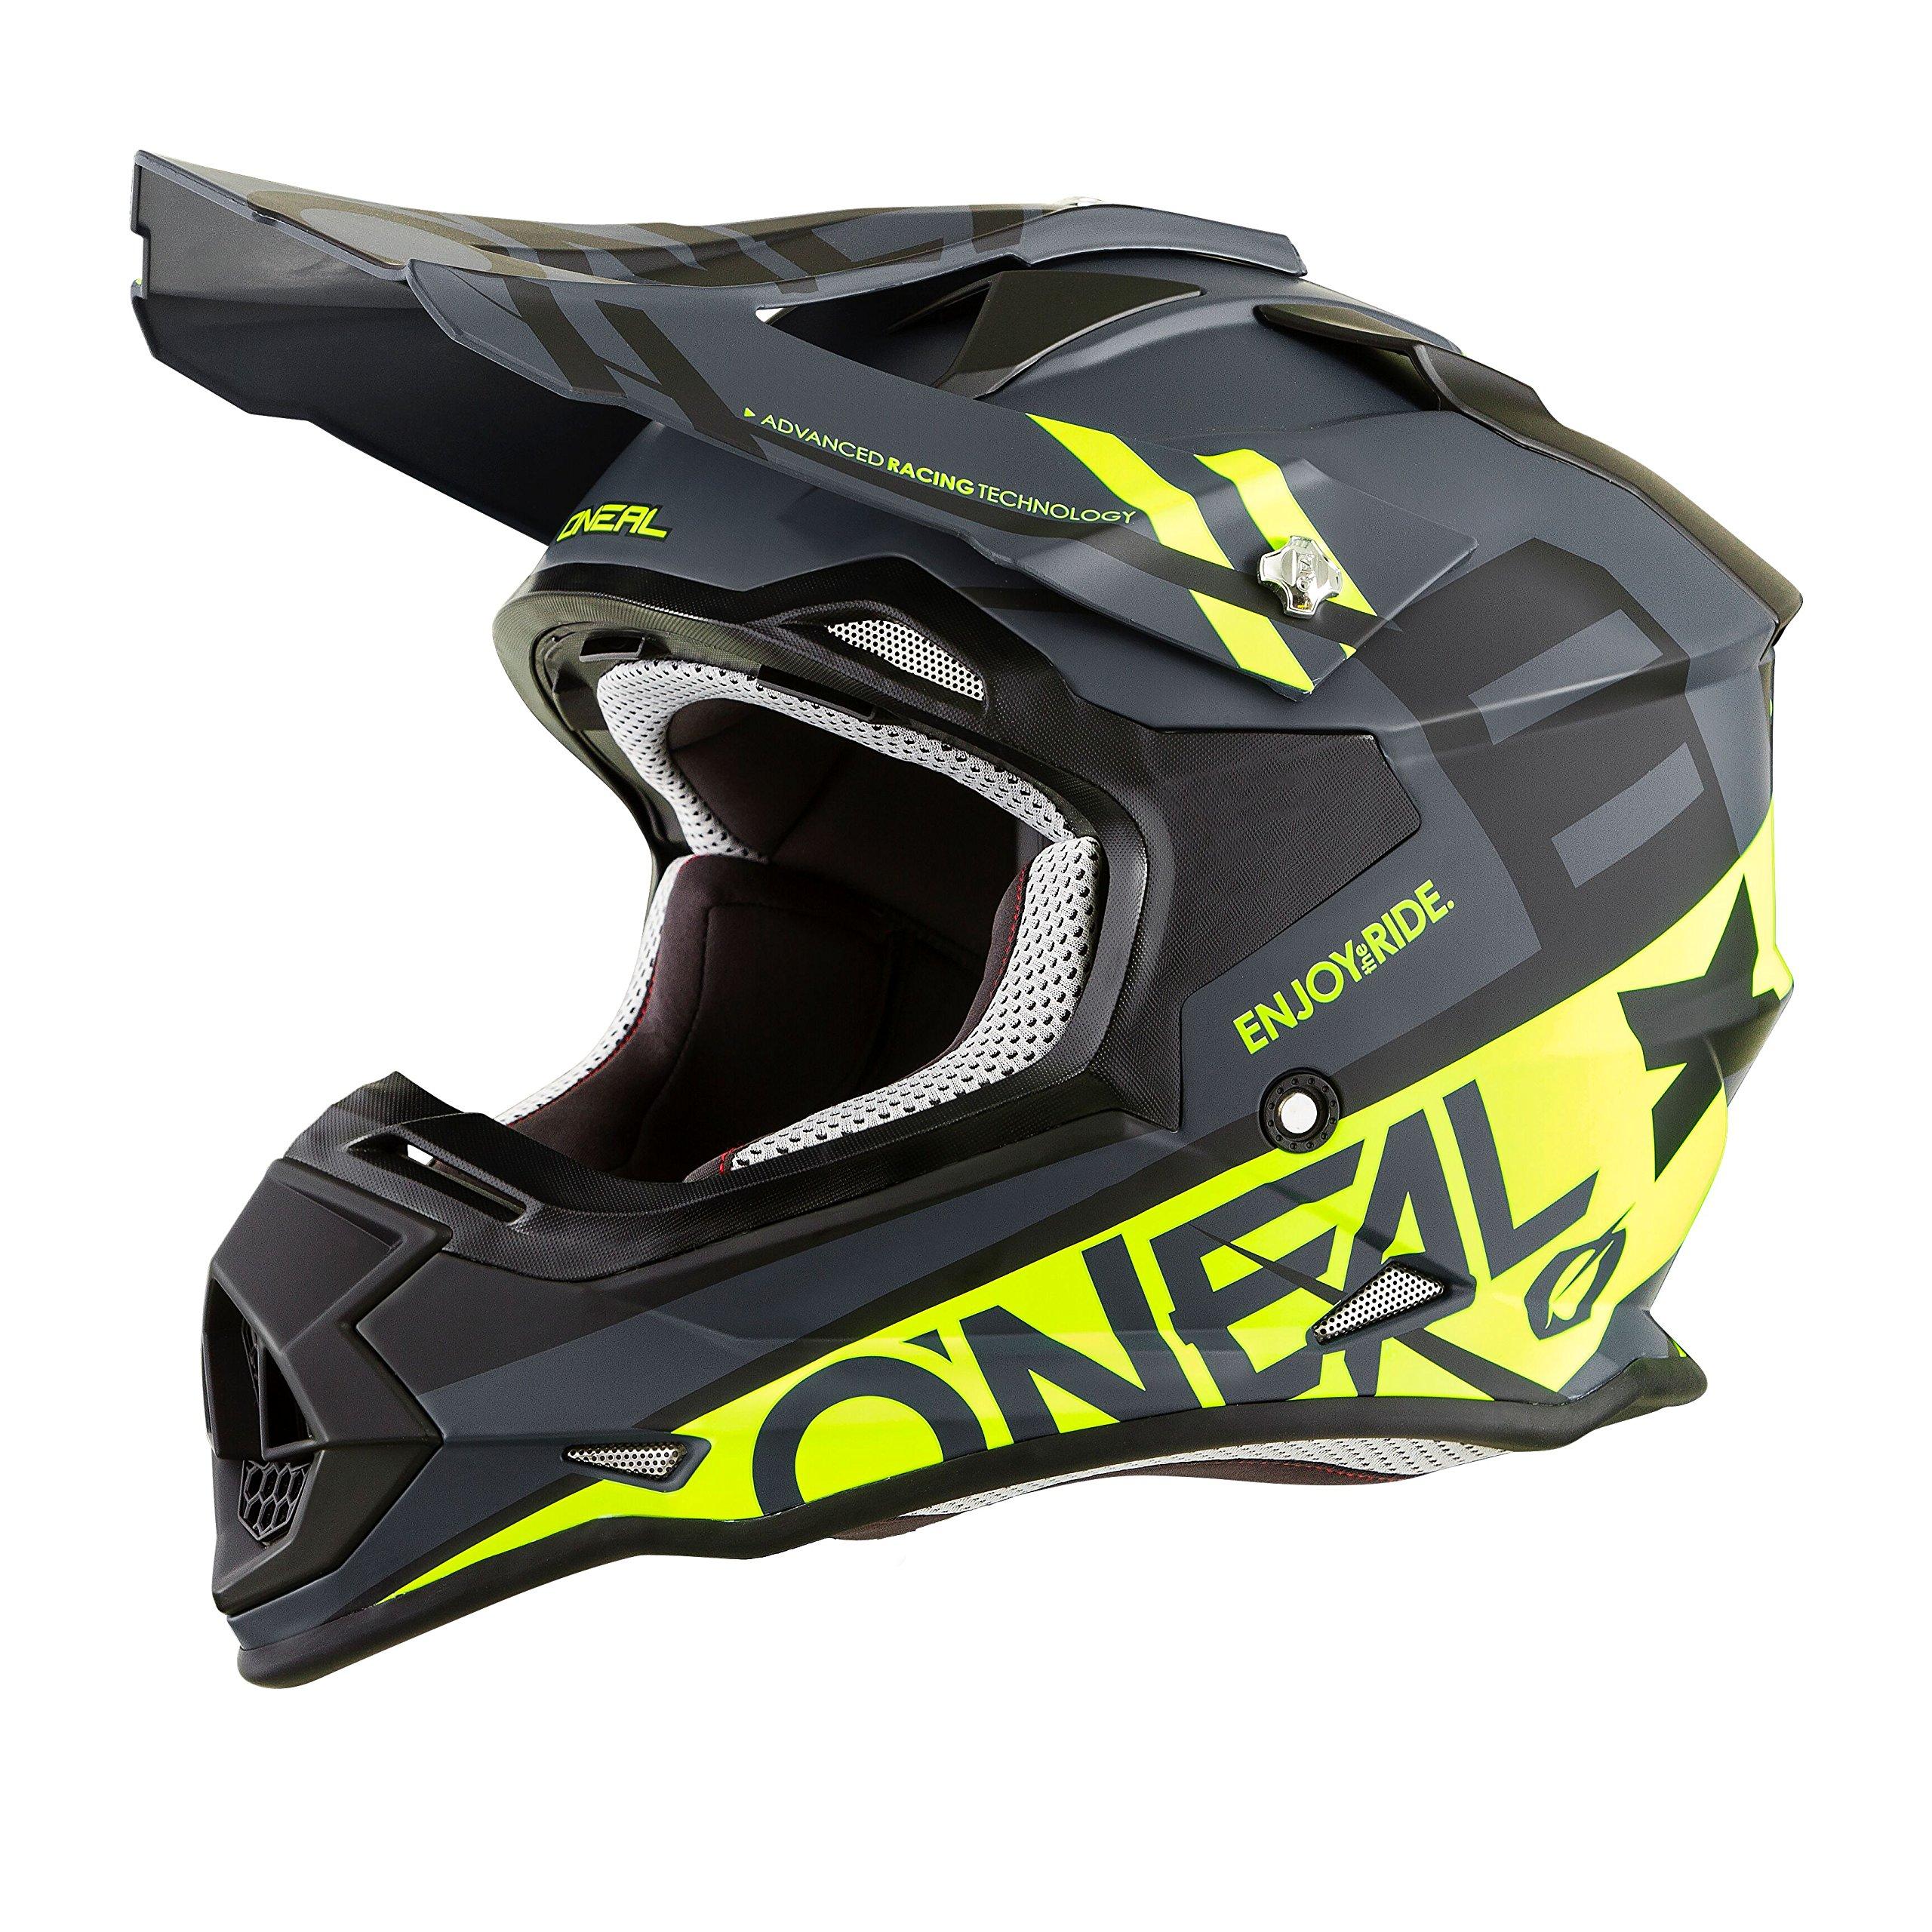 O'Neal Unisex-Adult 2SERIES Helmet (SPYDE) (Black/Hi Viz, X-Small) by O'Neal